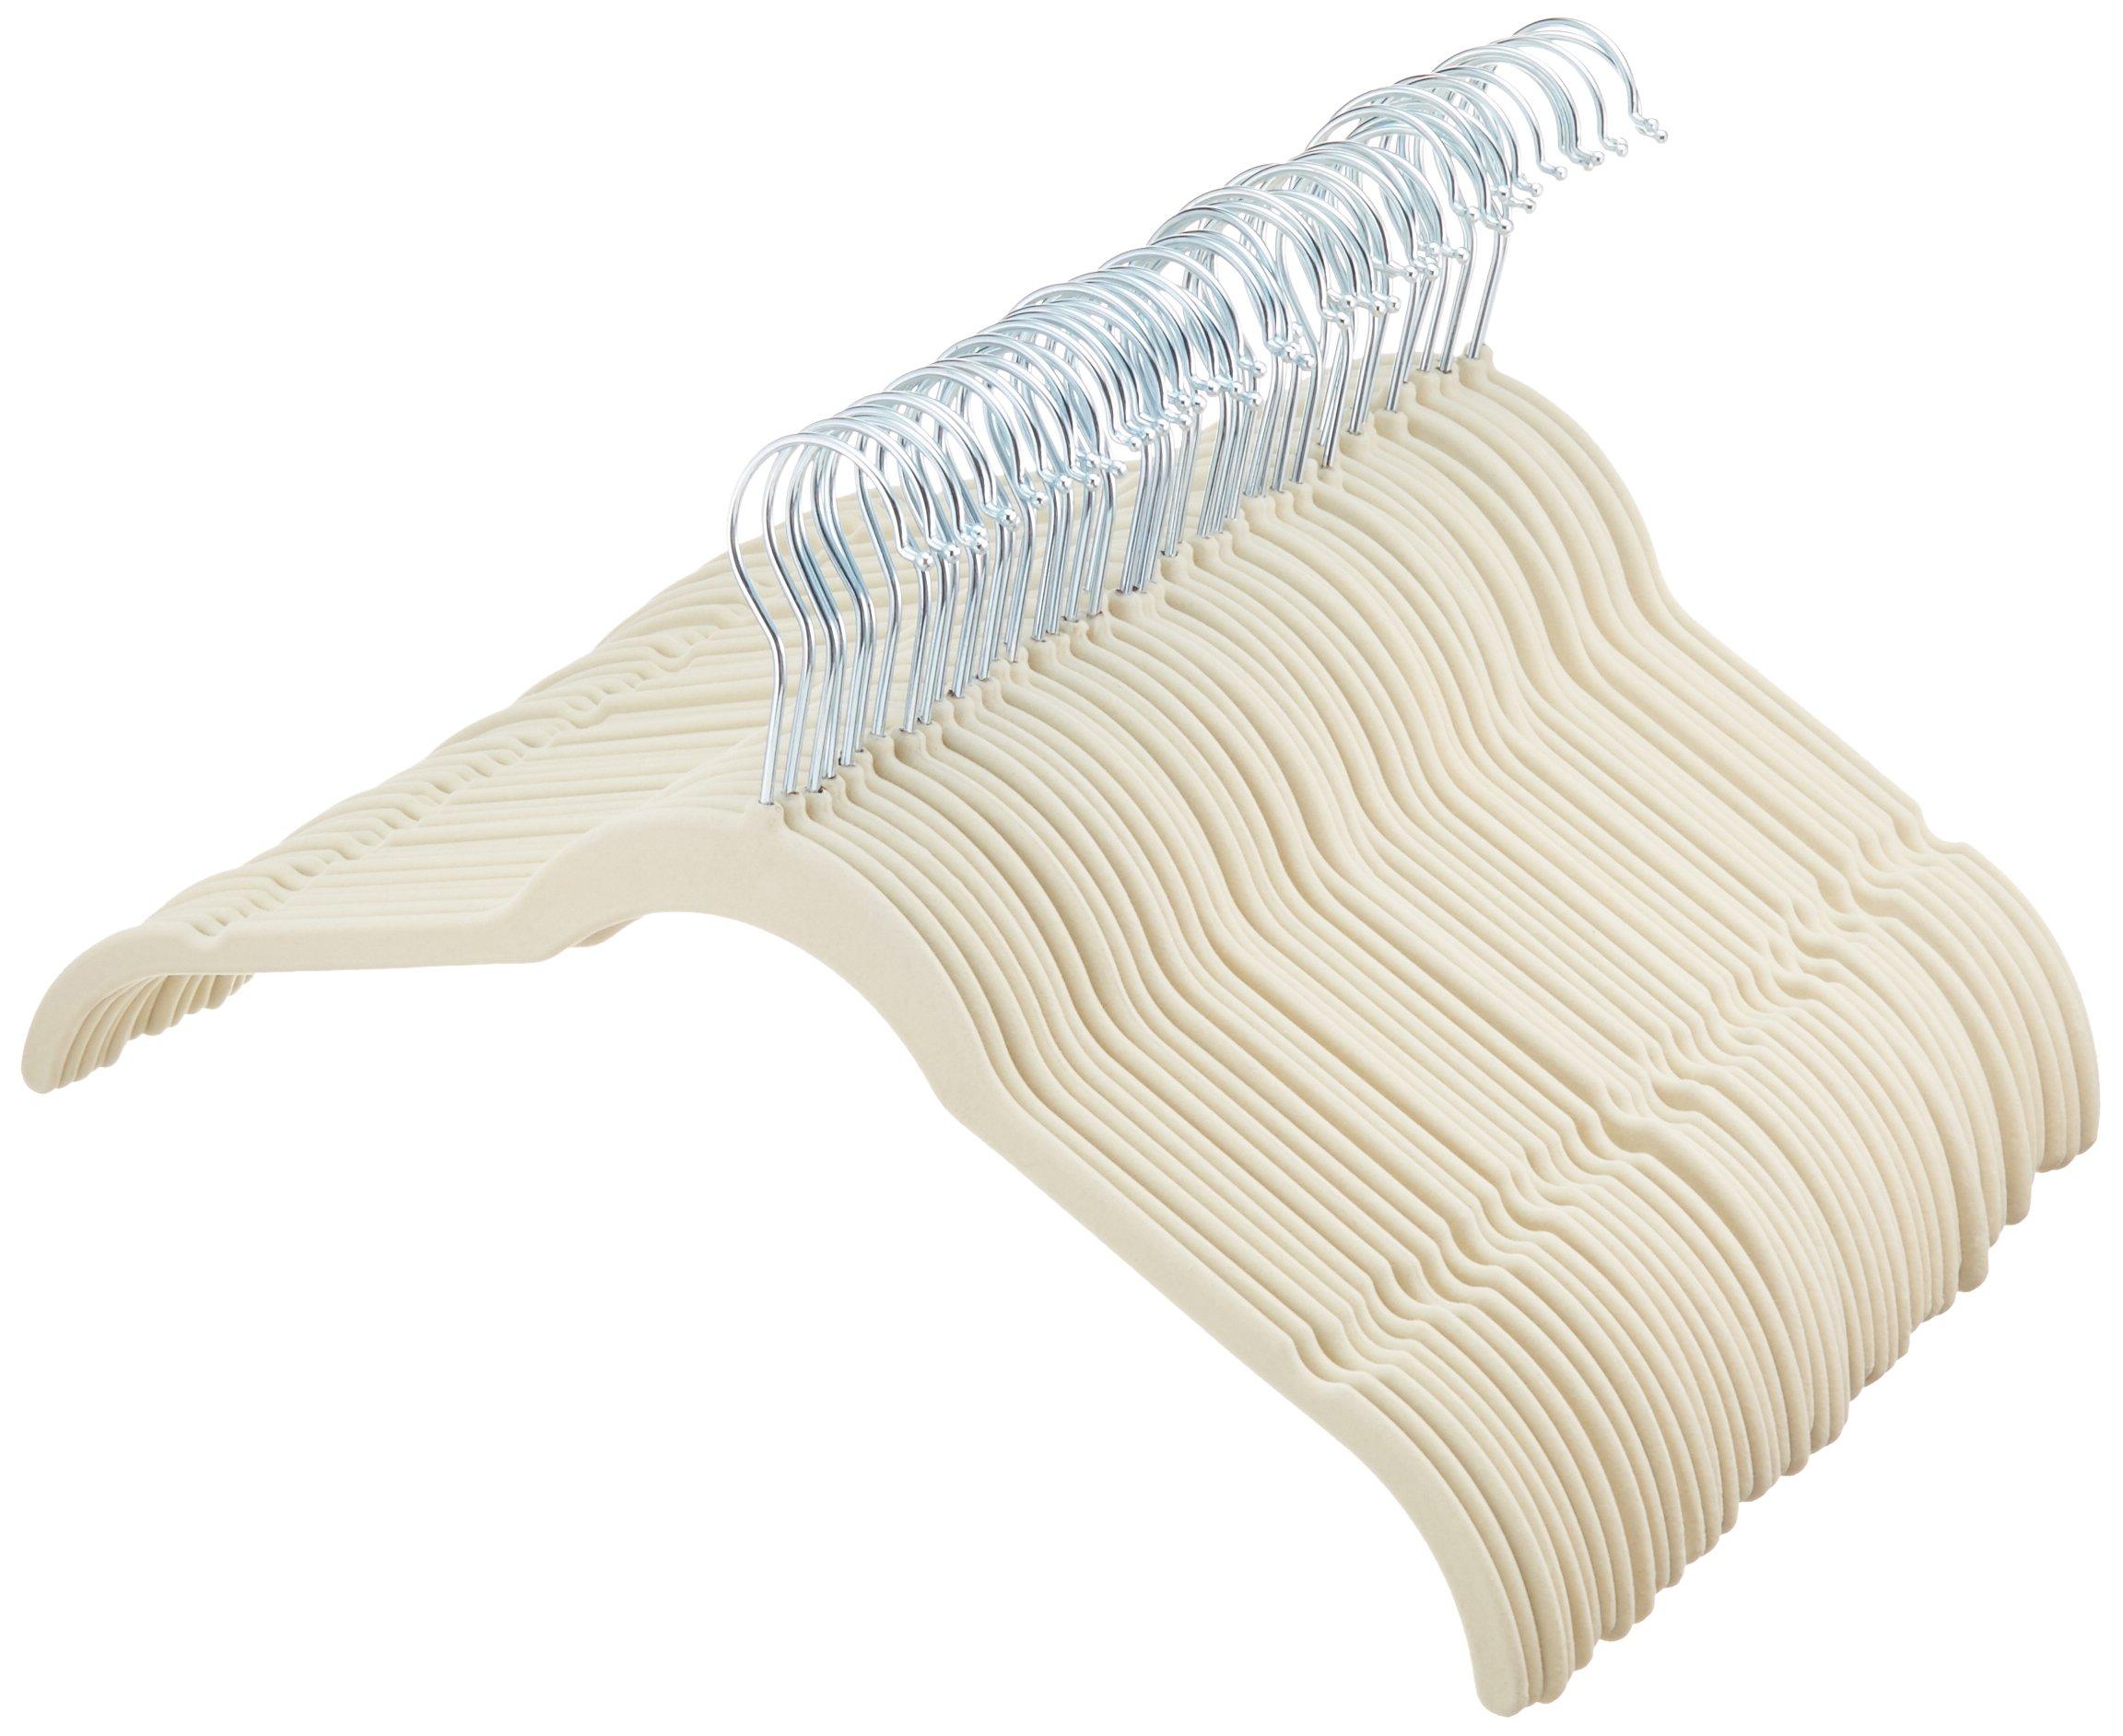 AmazonBasics - Perchas de Terciopelo para Camisas/Vestidos - Paquete DE 50, Marfil product